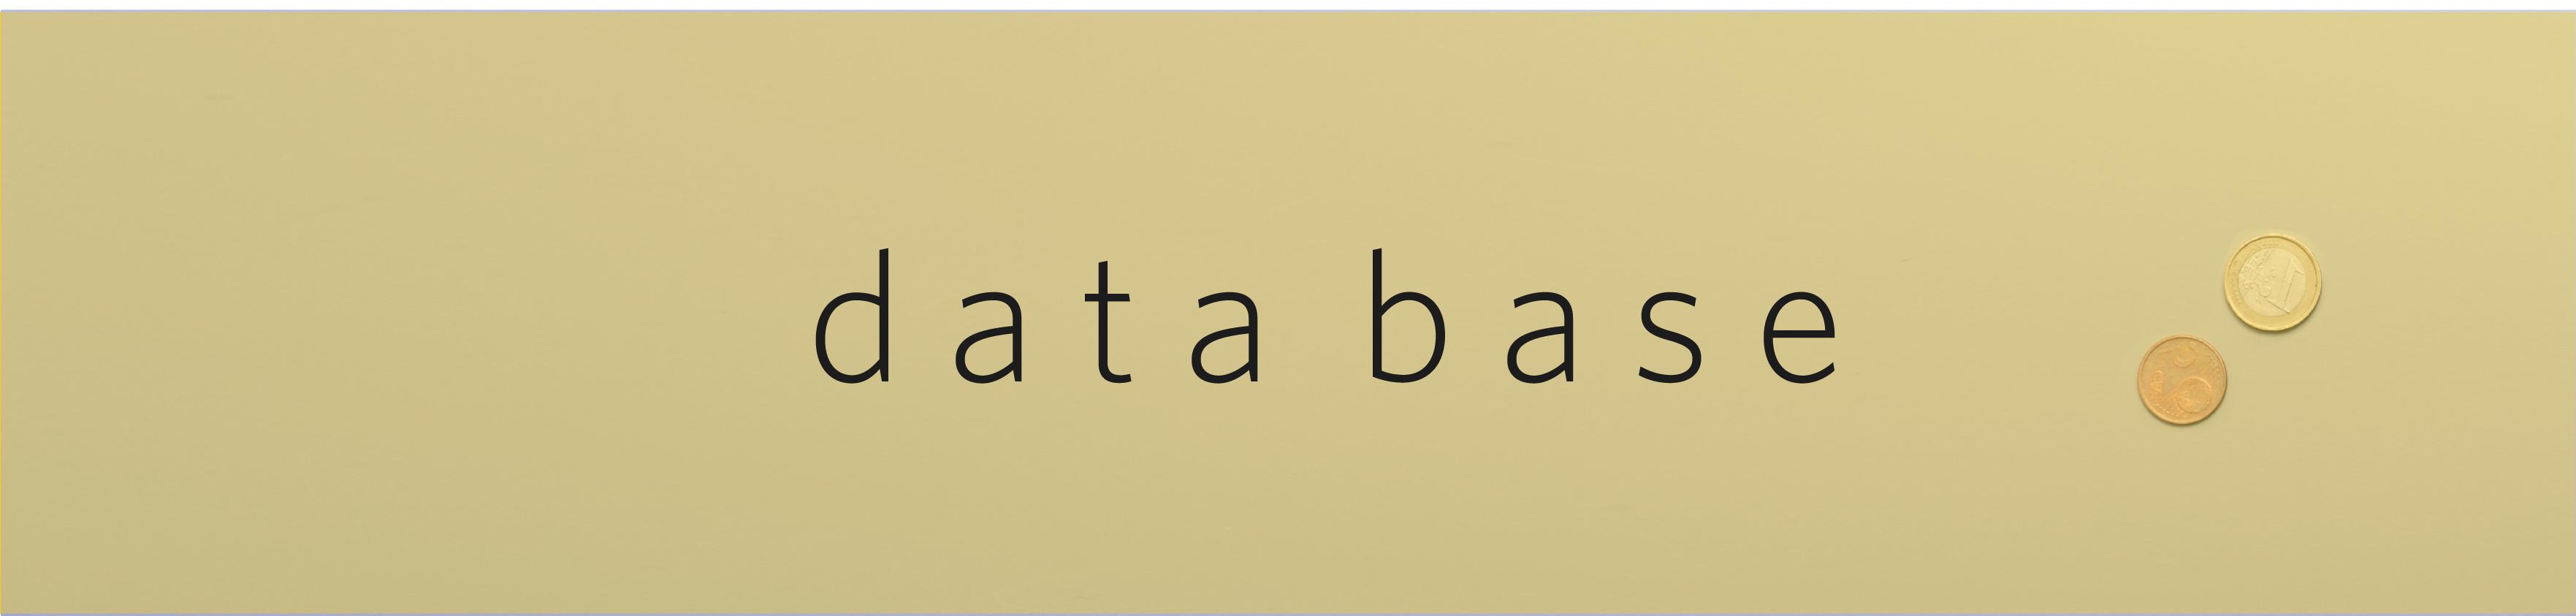 Data Base _ Banner@3x.png